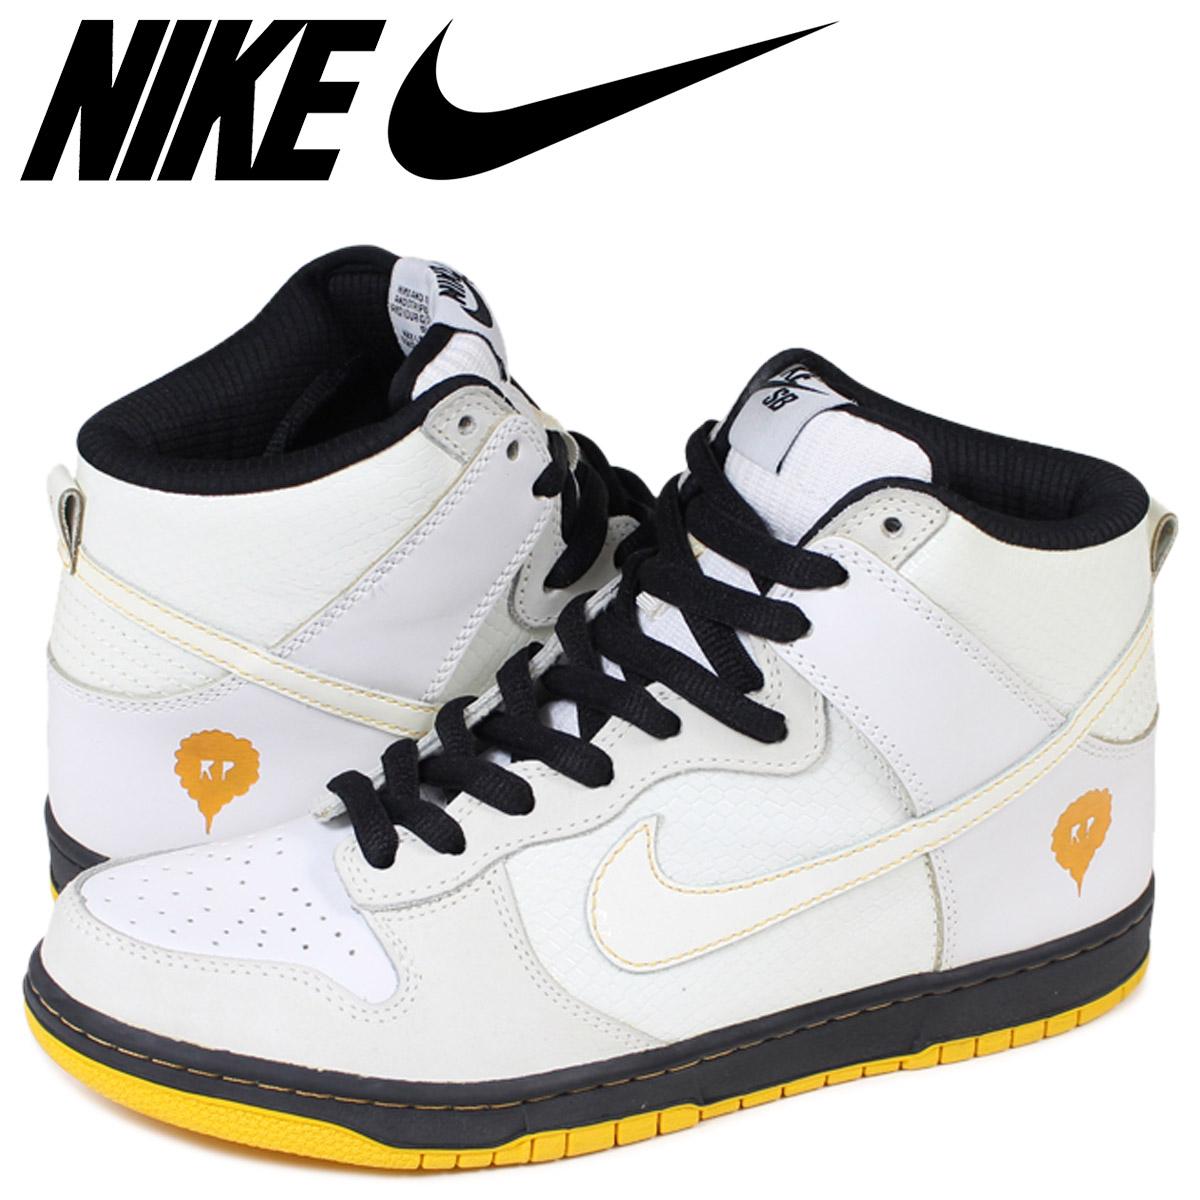 low priced 28eea 3fb6a Nike NIKE dunk sneakers DUNK HI CUSTOM SERIES MADE IN BRAZIL 320,701-102  white men